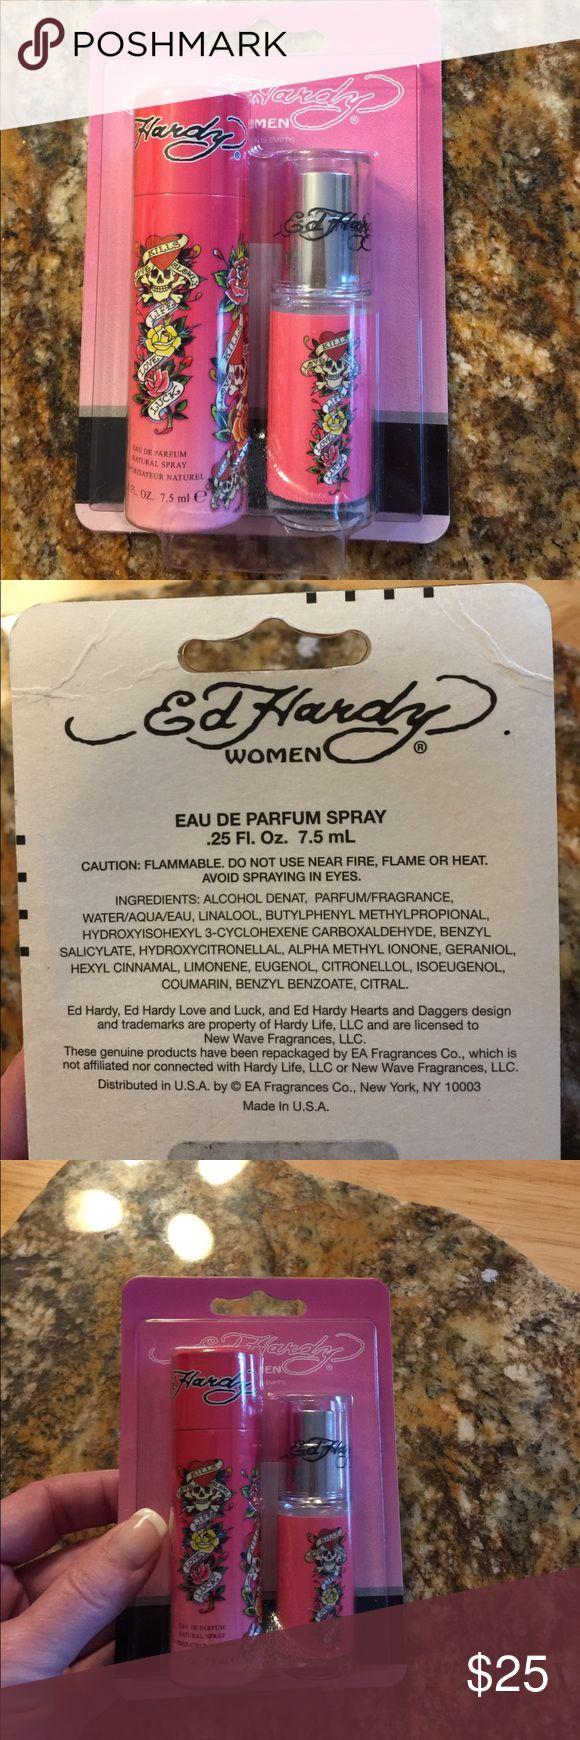 Ed Hardy Women spray! New! New! Ed Hardy Women Eau Dr Parfume spray. Perfect stocking stuffer!! Size: .25 Fl. Oz./7.5 mL. Has cute carrier tube! Ed Hardy Other